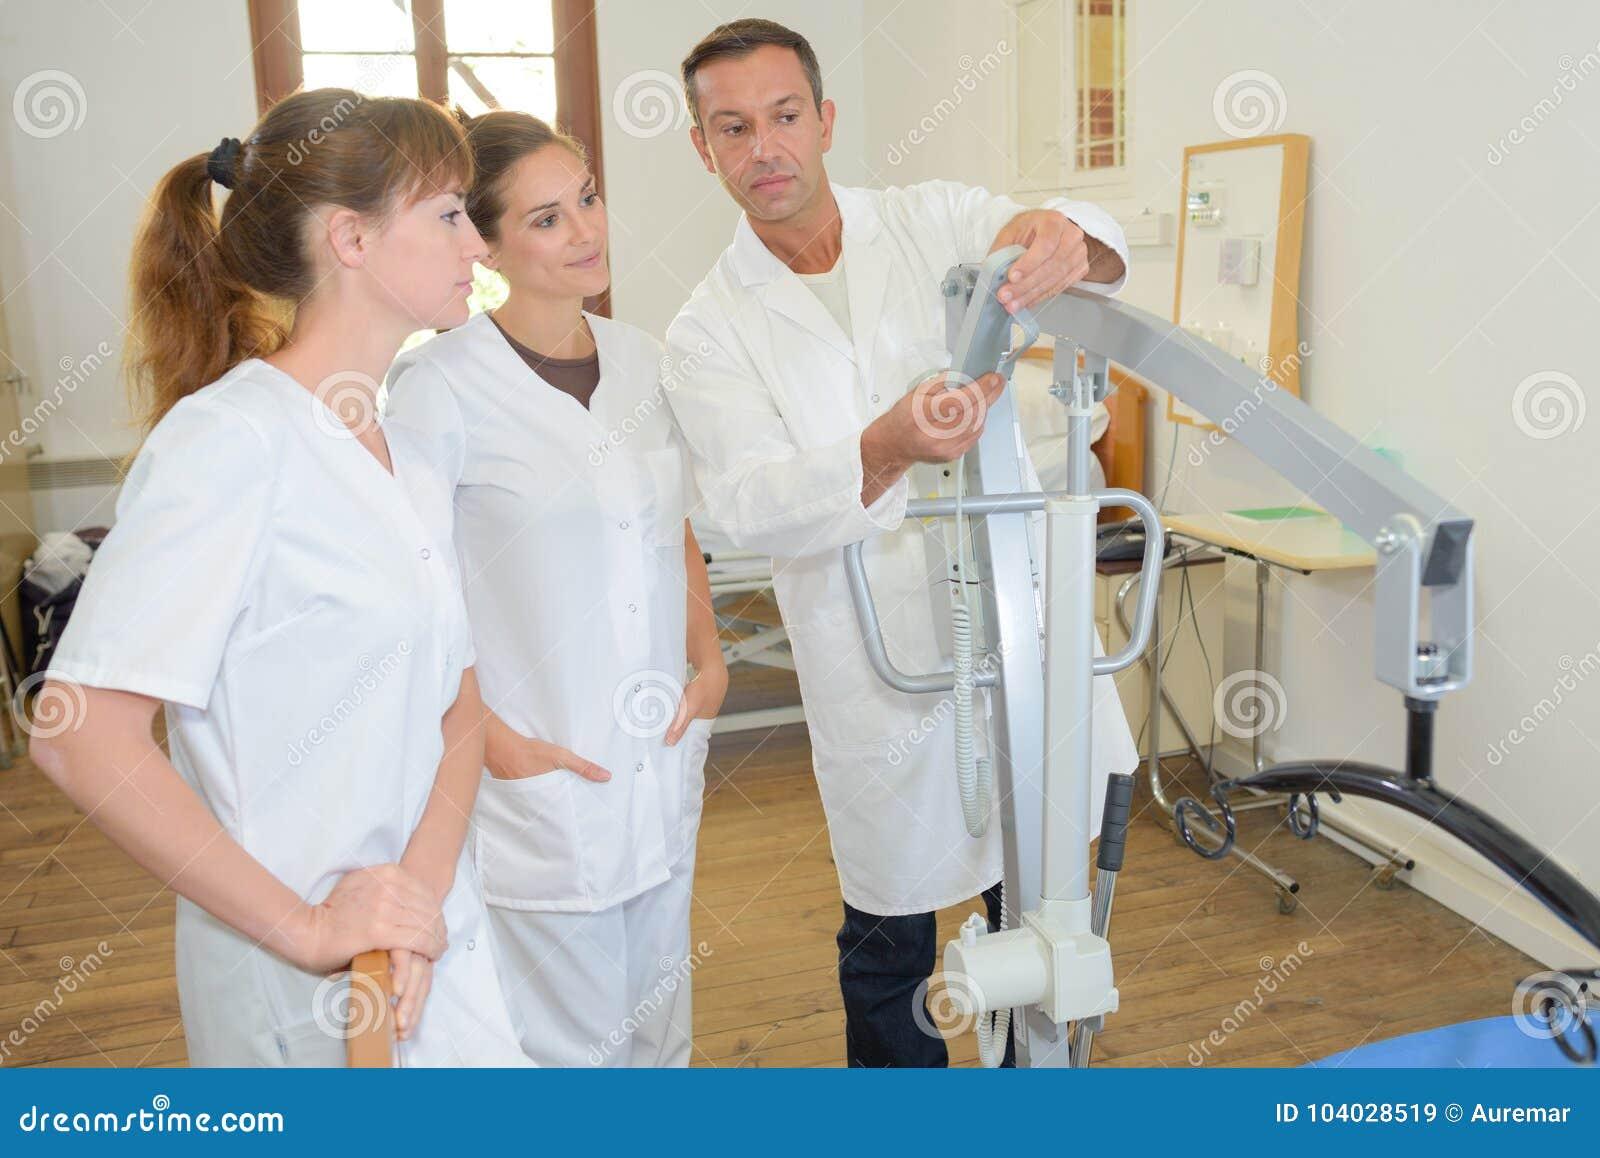 Twee homecareverpleegsters die leren hoe te hijstoestel te gebruiken